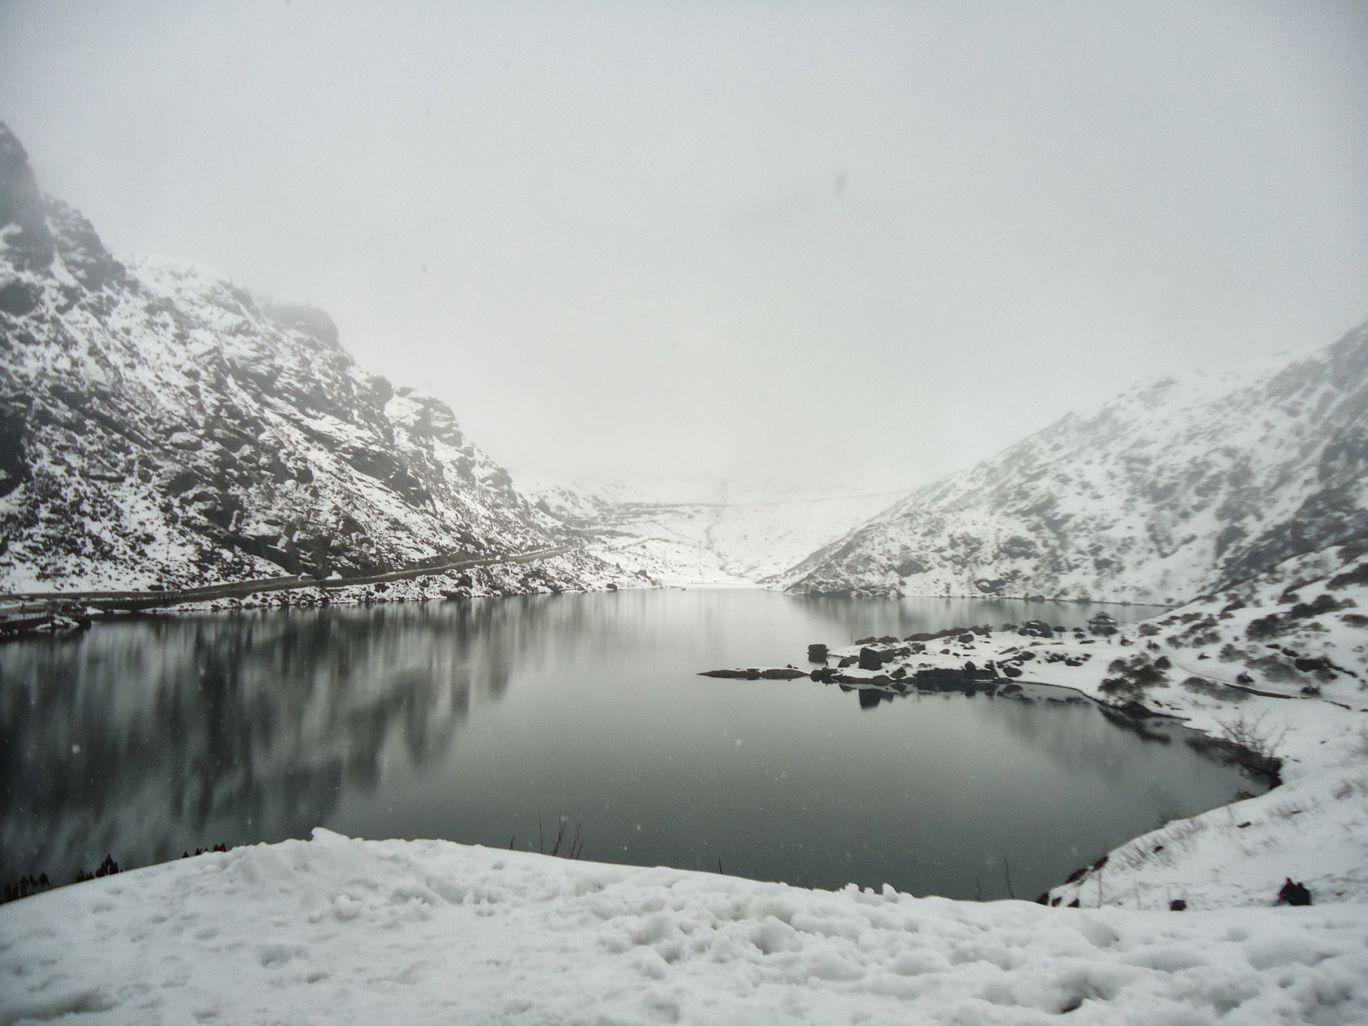 Photo of Tsomgo Lake By Dipti Trivedi